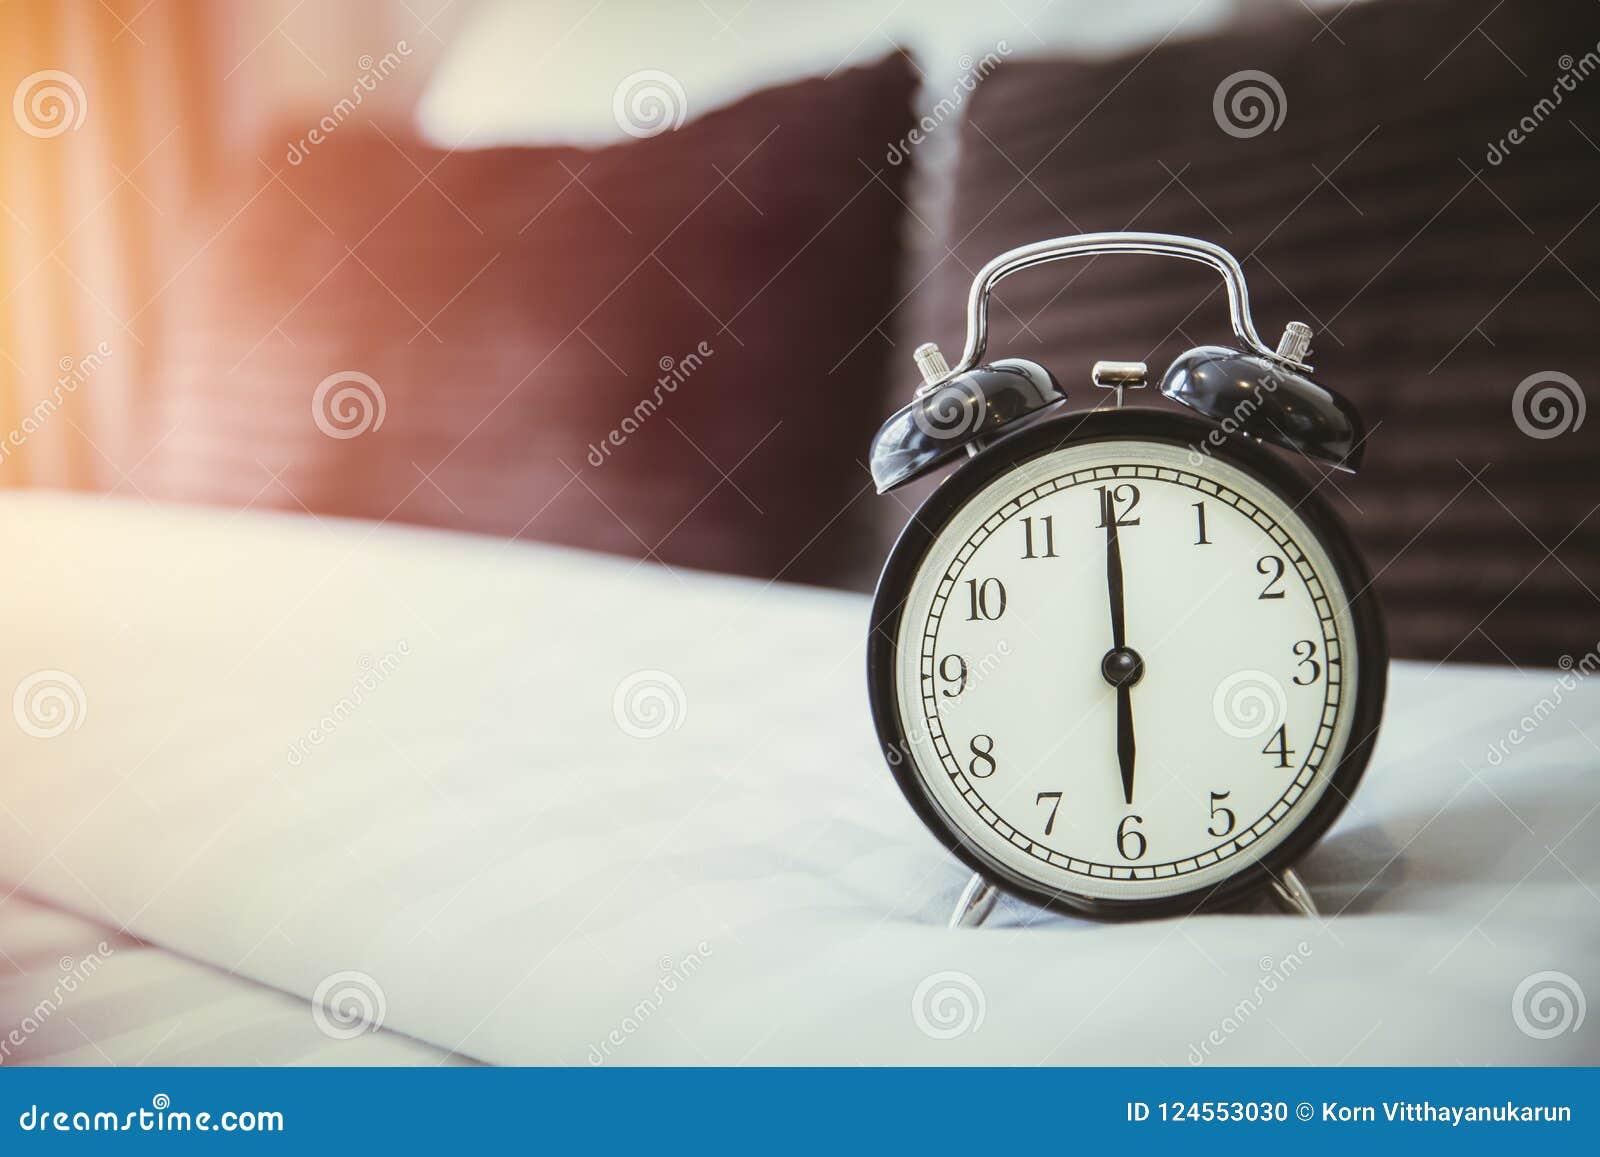 Retro clock on bad morning wake up times 6 o`clock